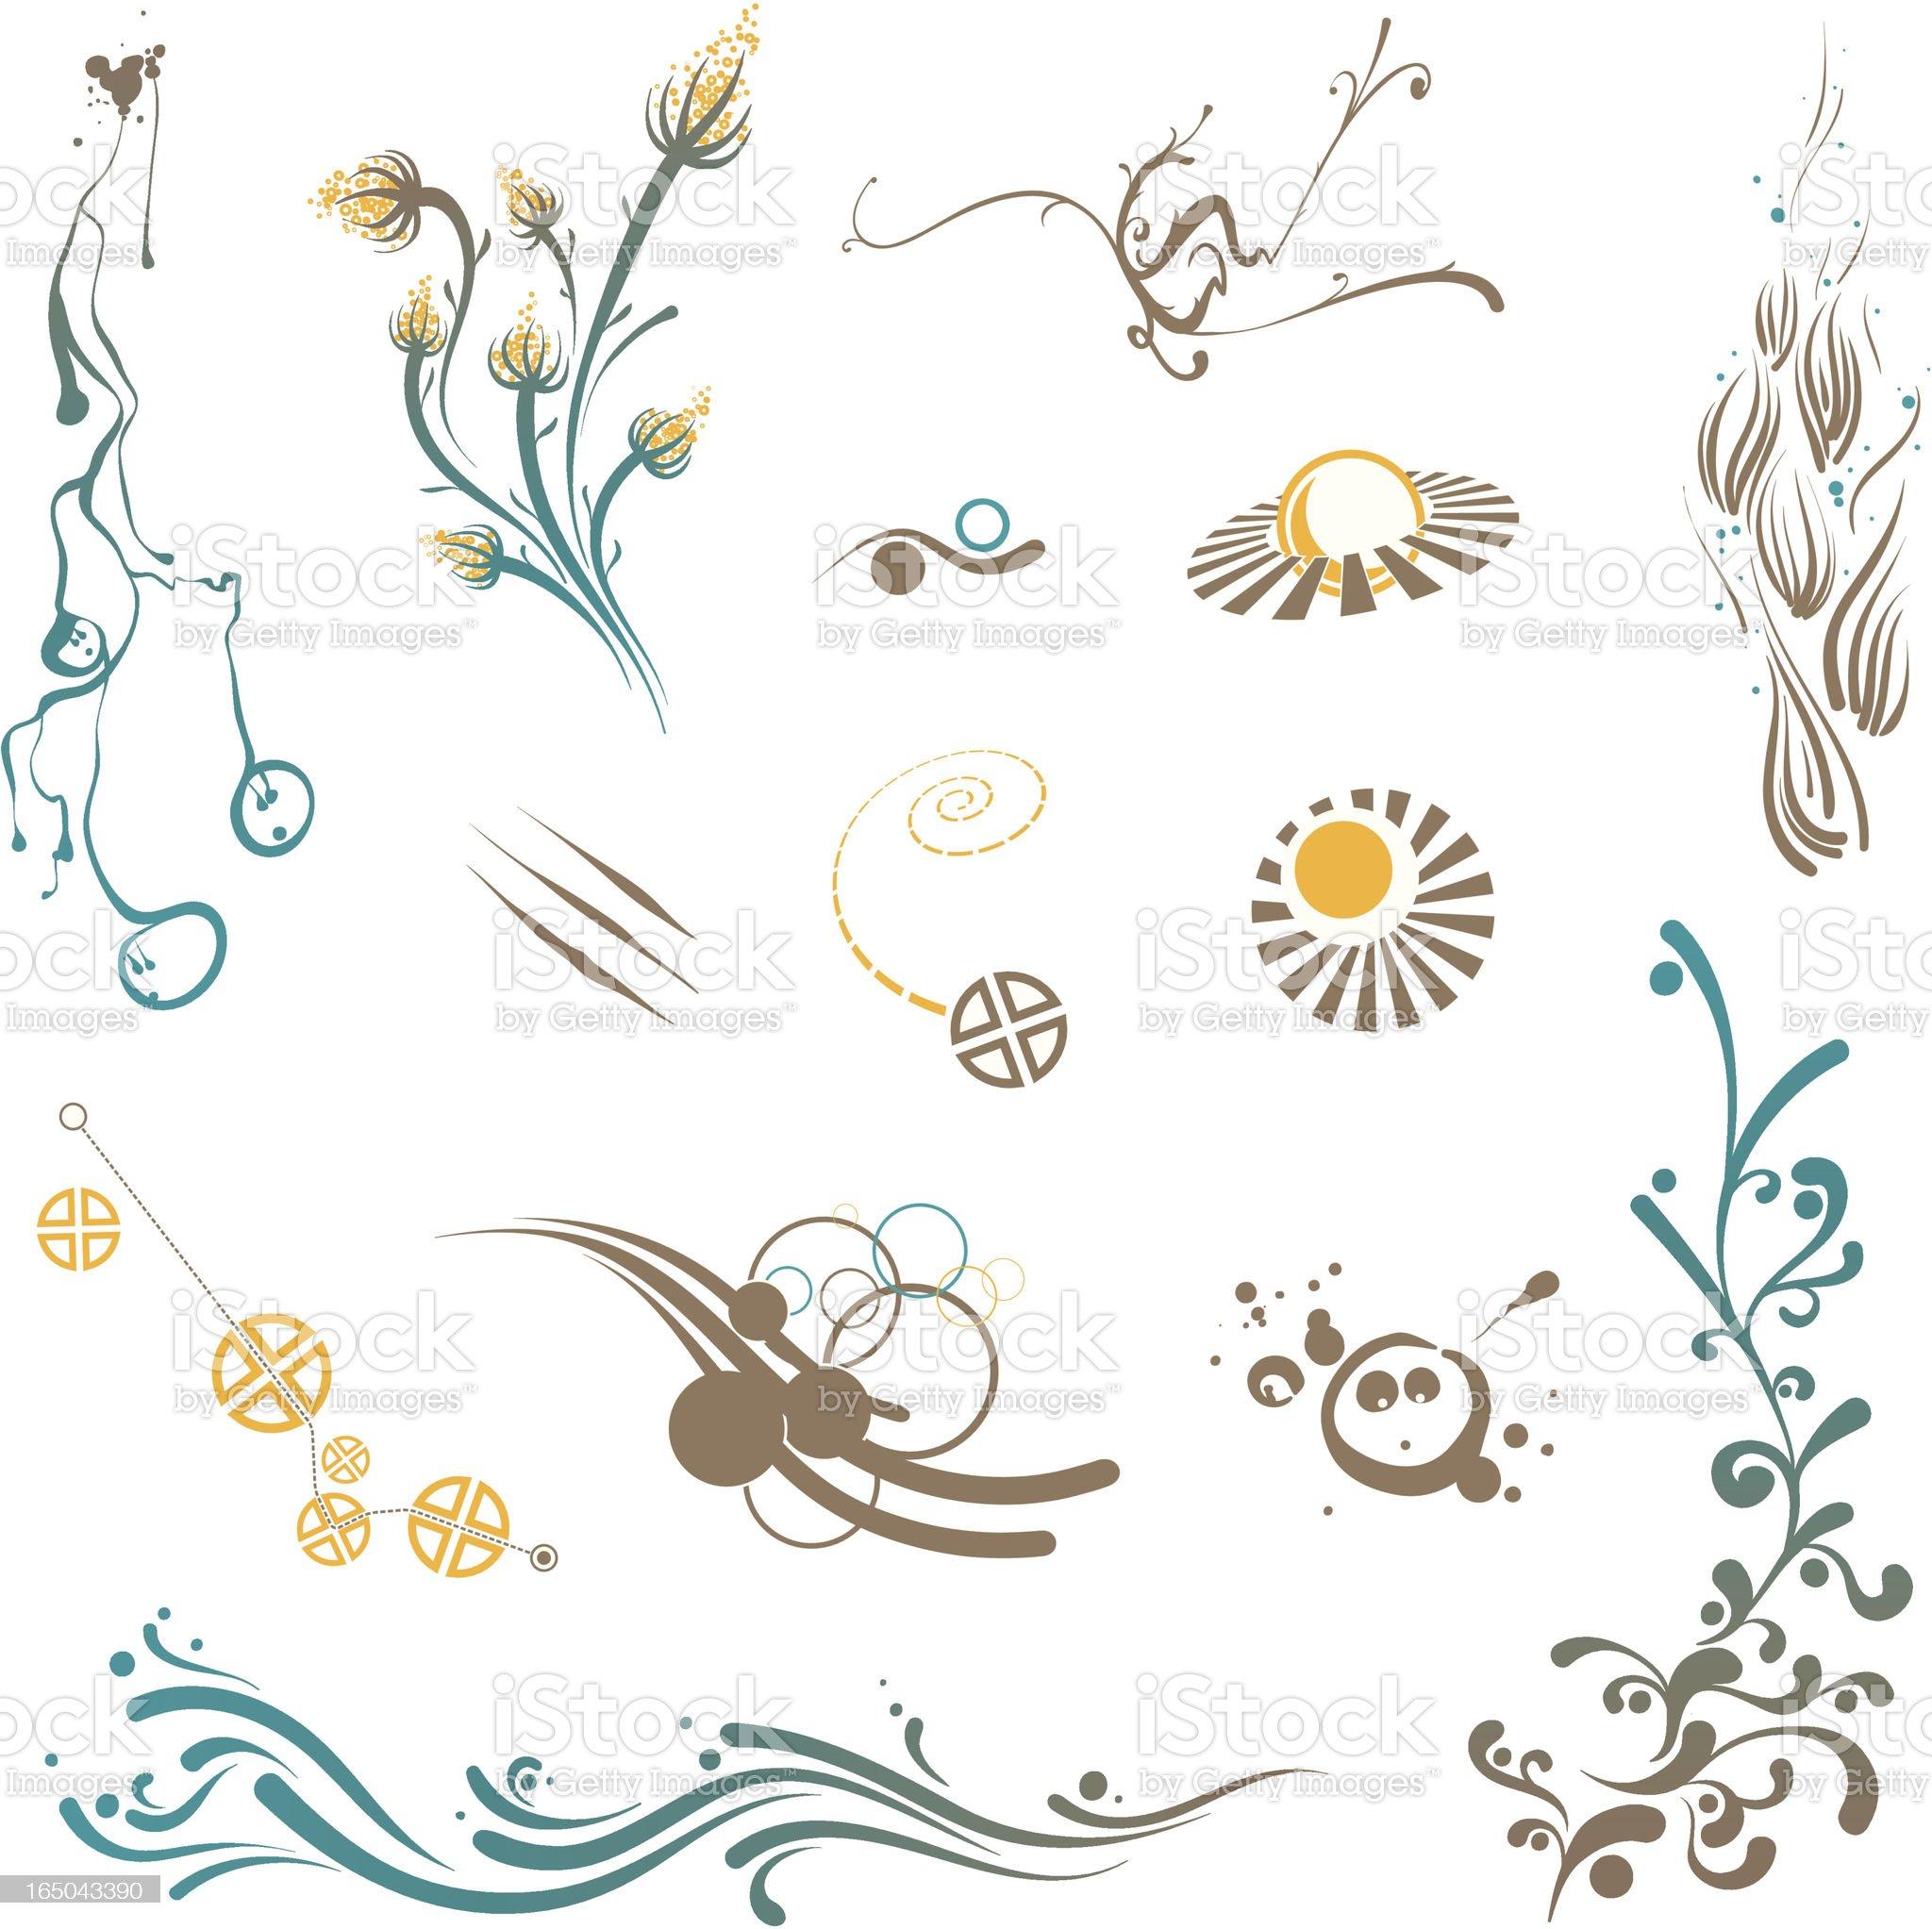 Design Elements Set, icons, symbols, geometric shapes royalty-free stock vector art